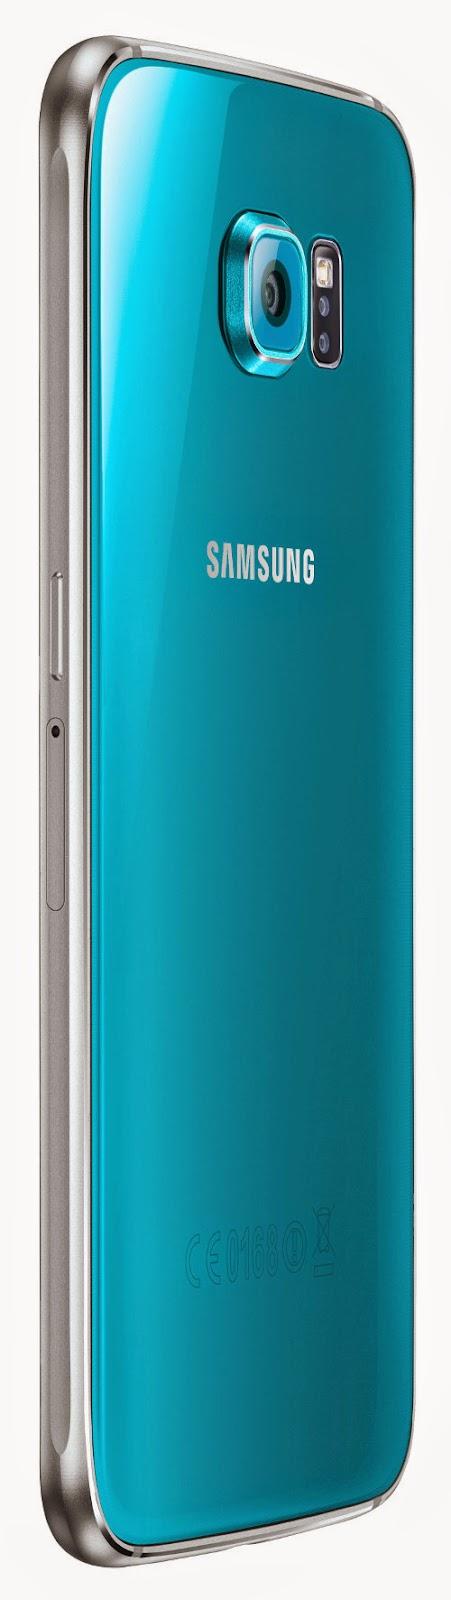 Samsung Galaxy S6 - G920F - Blue Topaz